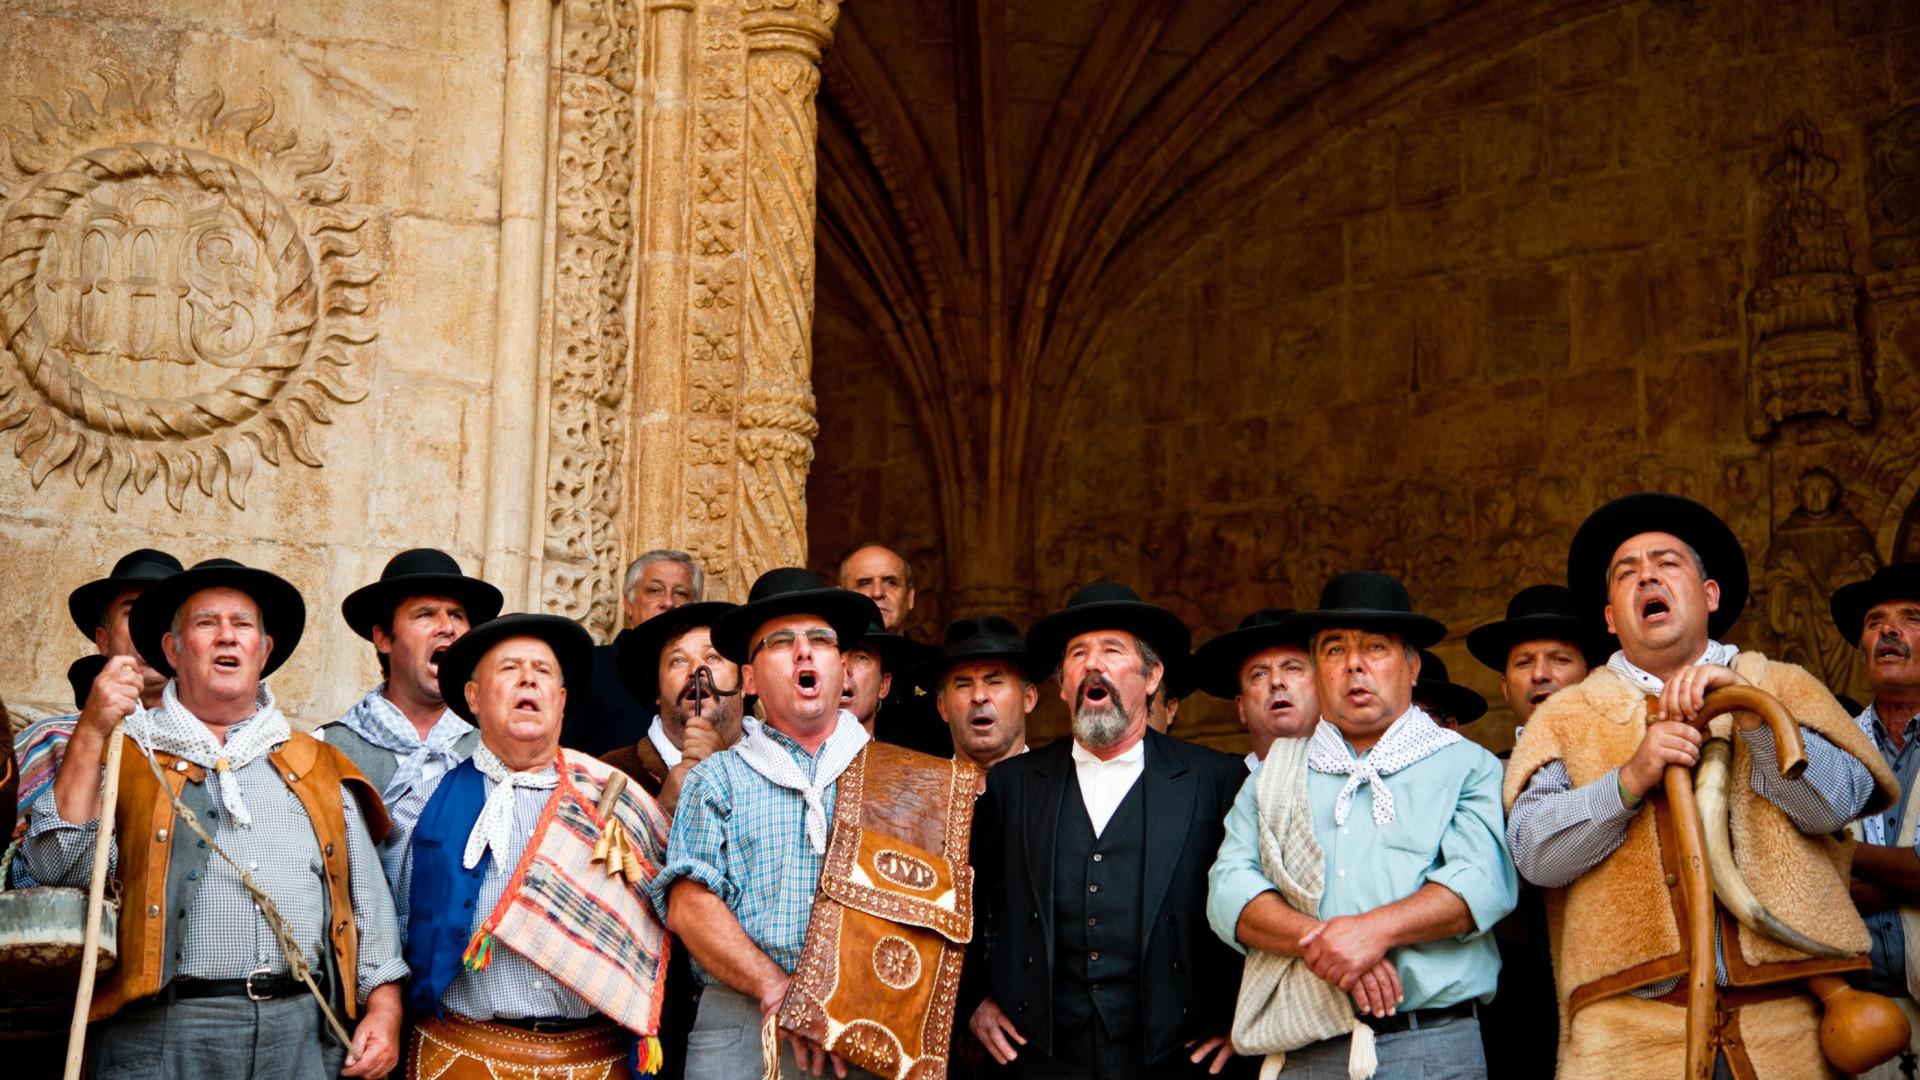 Cante: Dois anos de Património Mundial comemorados no Alentejo e Lisboa